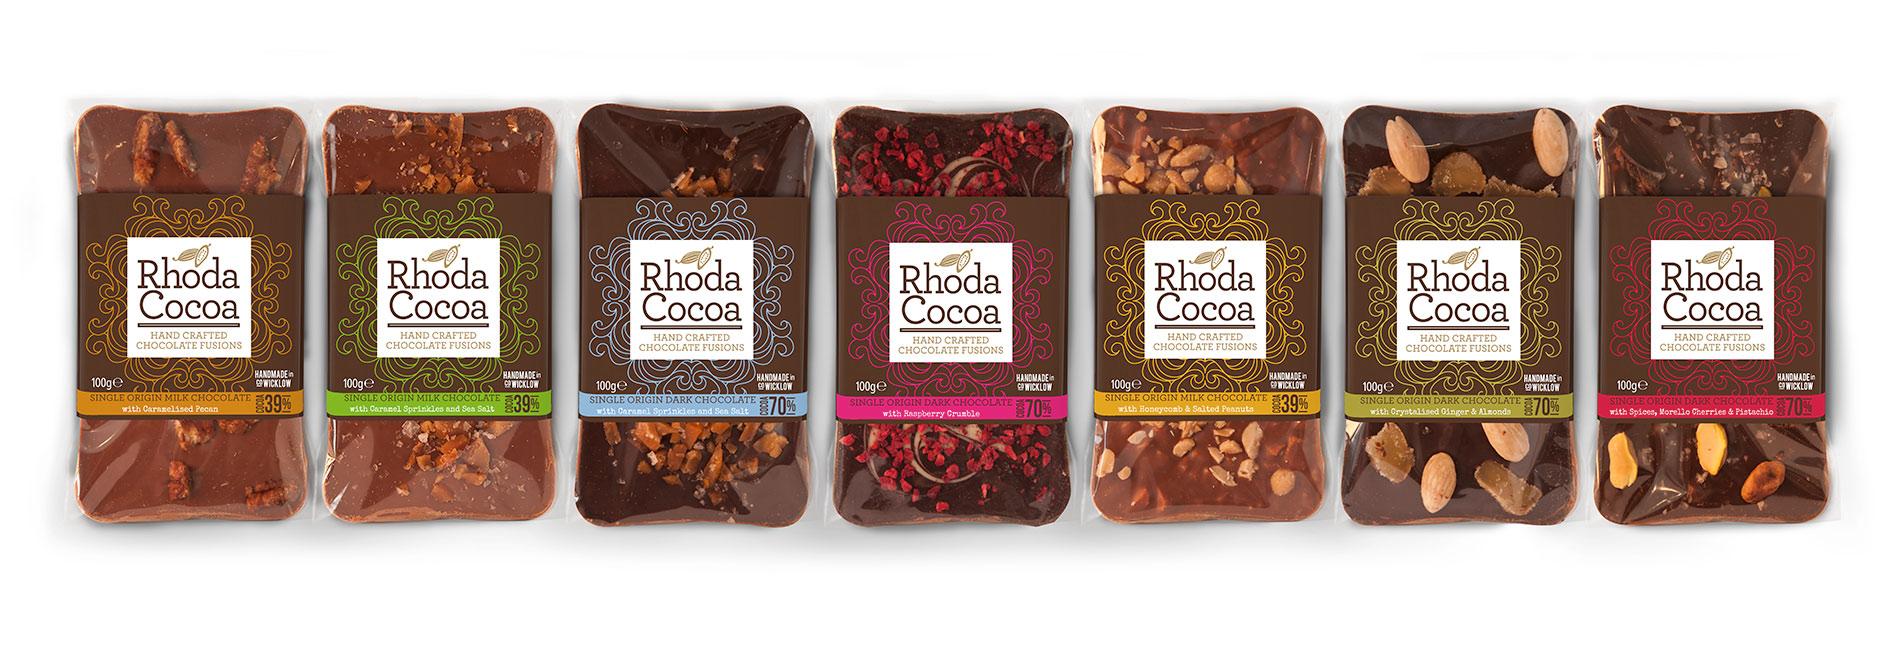 Rhoda-Cocoa-Range-white.jpg